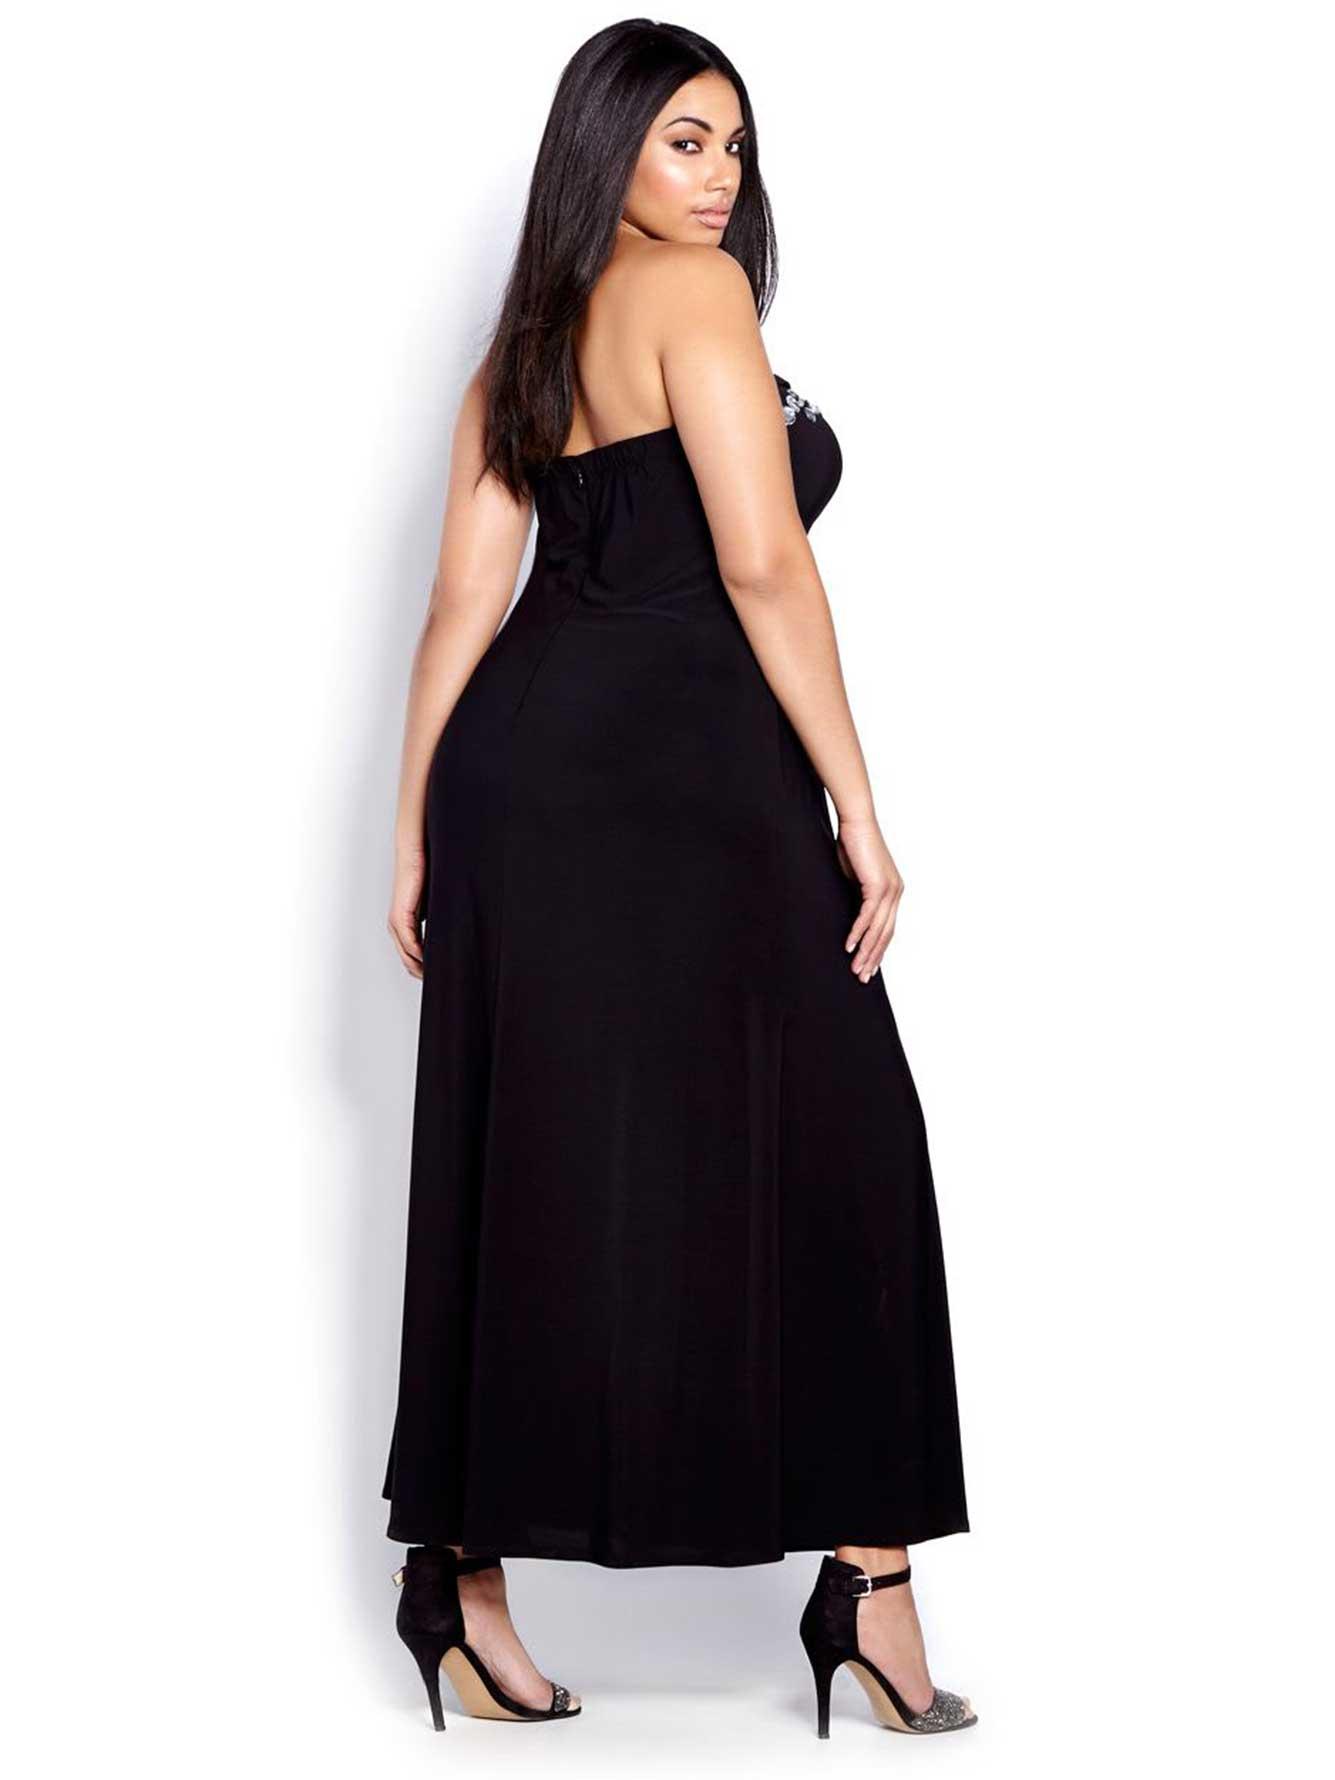 New Noir Strapless Bustier Evening Dress | Addition Elle